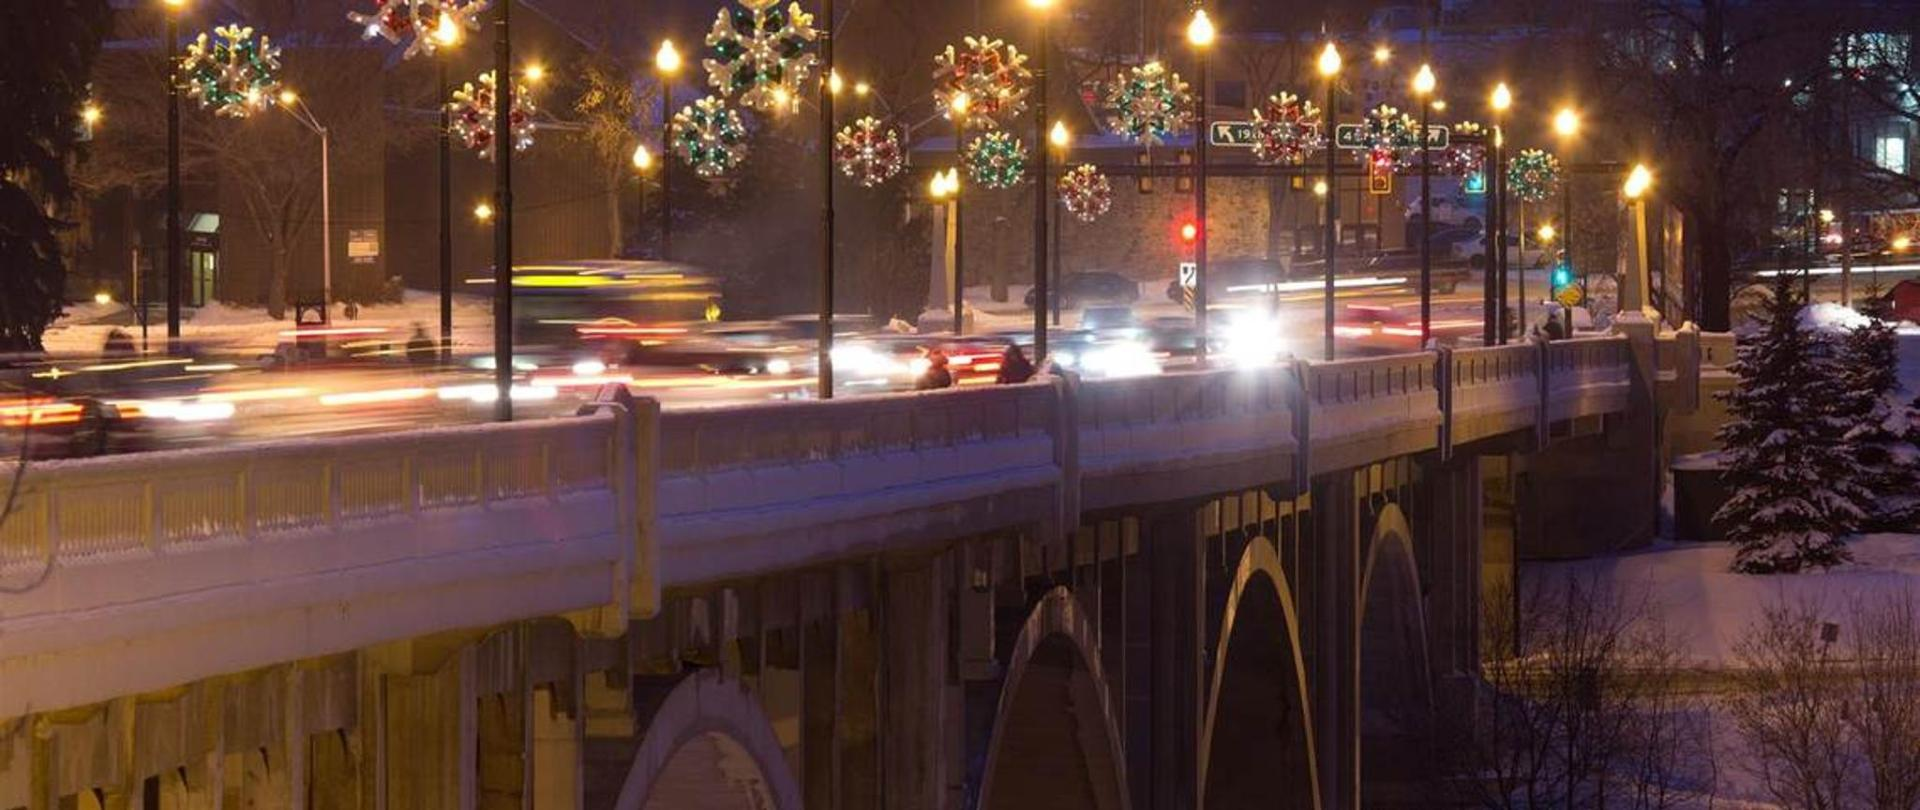 broadway-bridge-lit-up-for-christmas-compliments-of-tourism-saskatoon.jpg.1140x481_default.jpg